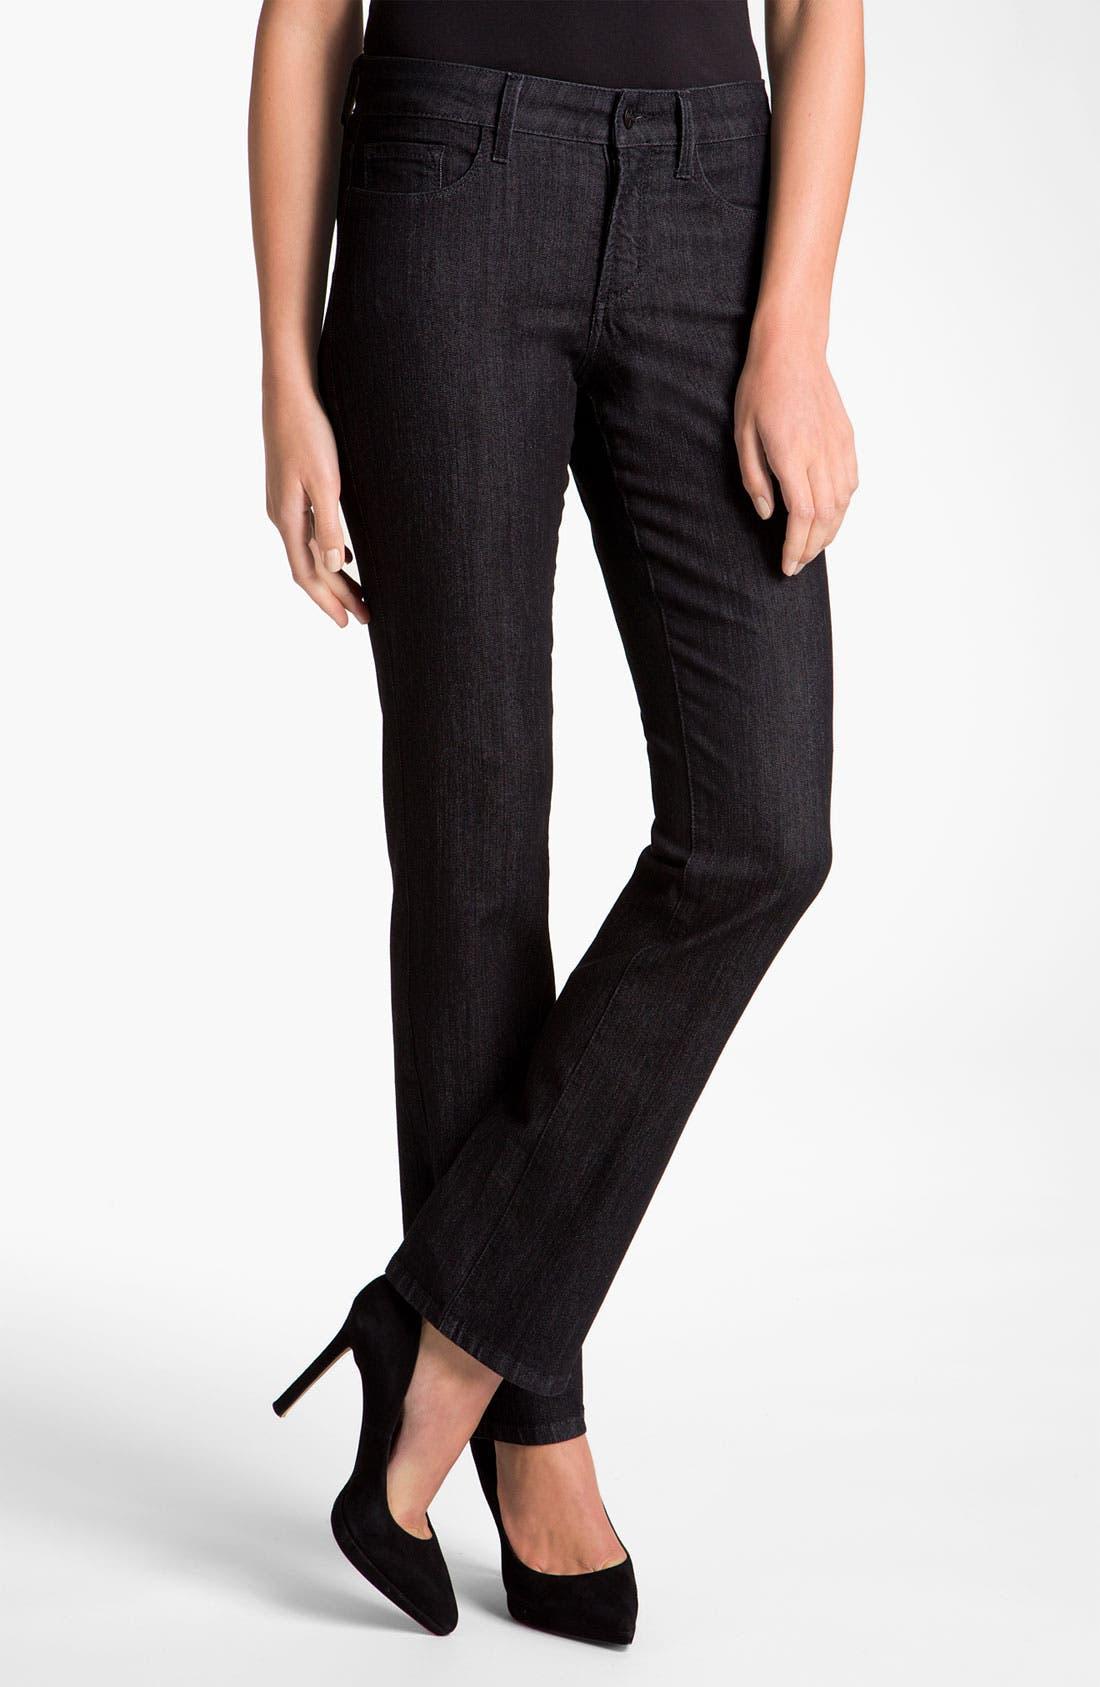 Main Image - NYDJ Embroidered Pocket Jeans (Petite)